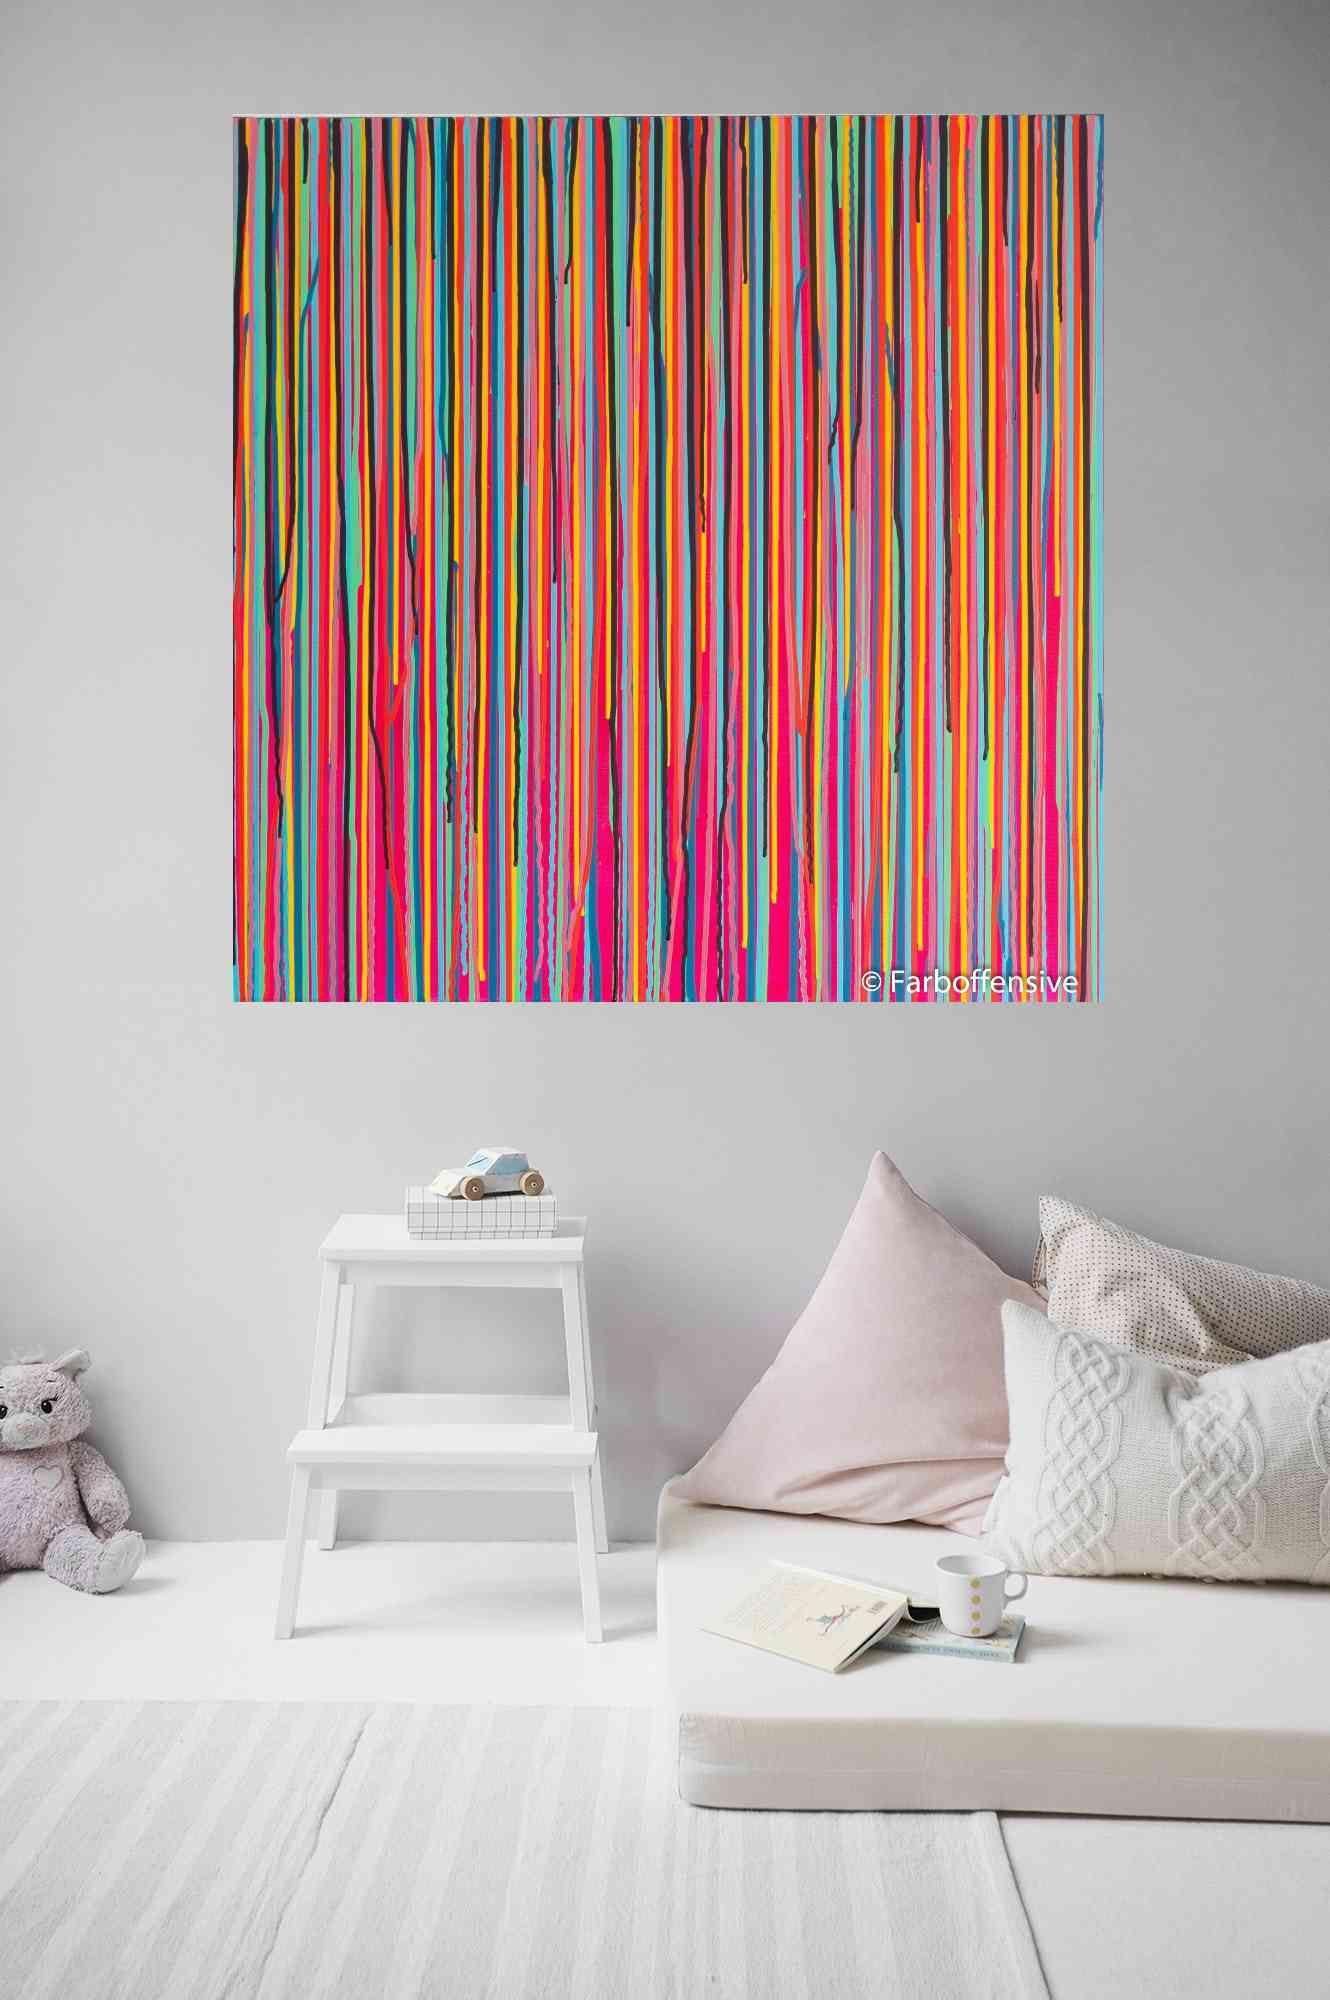 Acrylbild, Acrylbilder Abstrakte Malerei, original, Acryl, modern, abstract art, Gemälde, Kunst, bunt, pink , Leinwand, 80x80cm